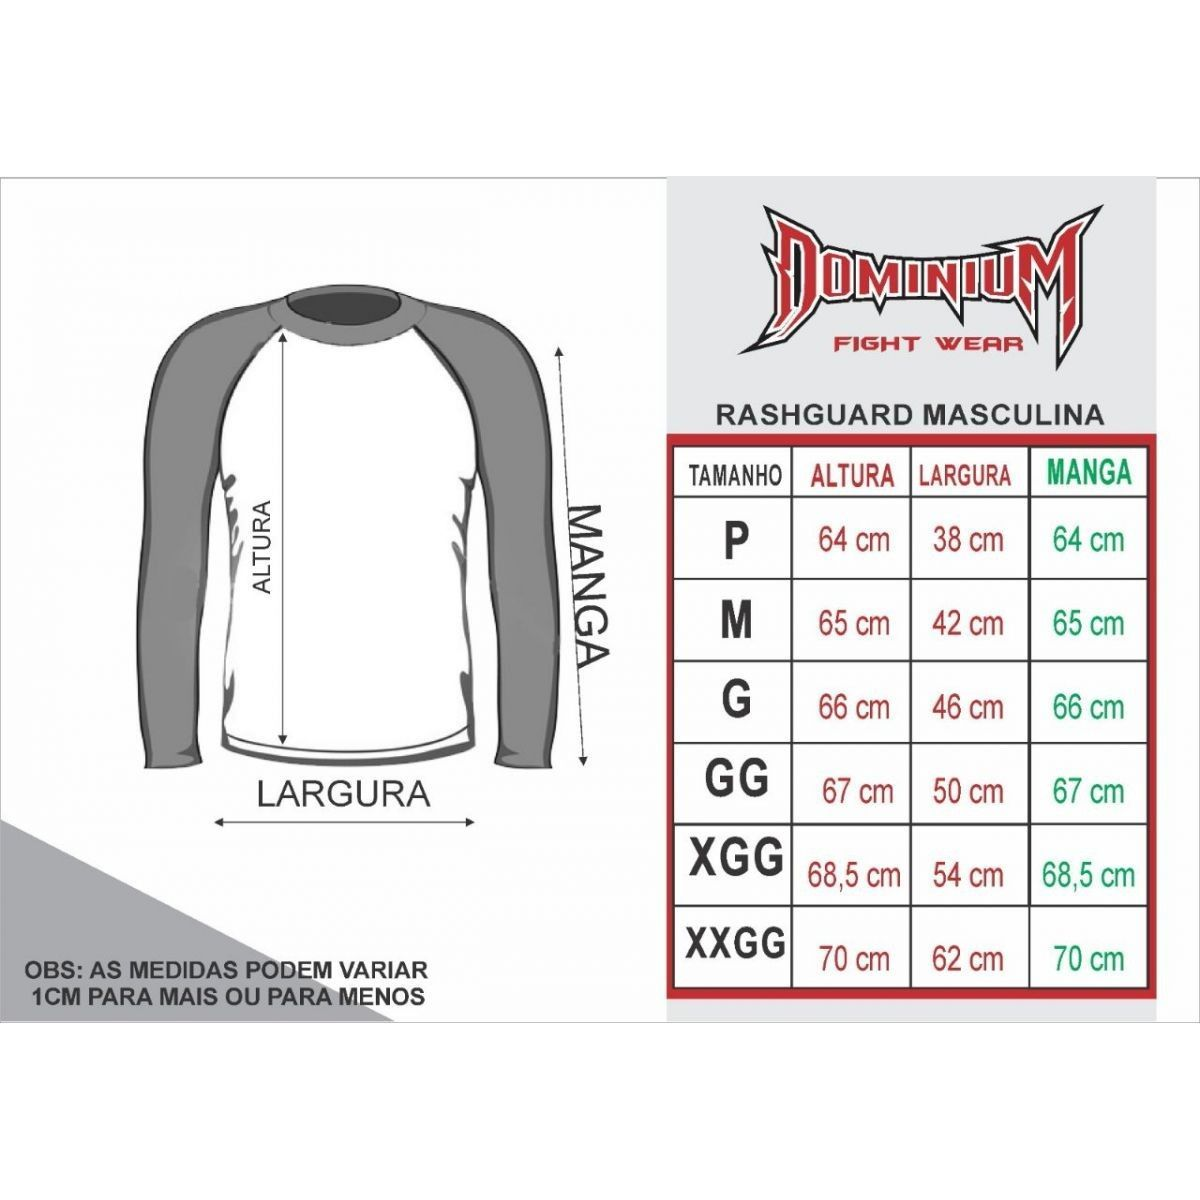 Camisa Rash Guard - Manga Longa - Preto/Laranja - Jiu Jitsu Competidor - 2797LA- Dominium  - Loja do Competidor